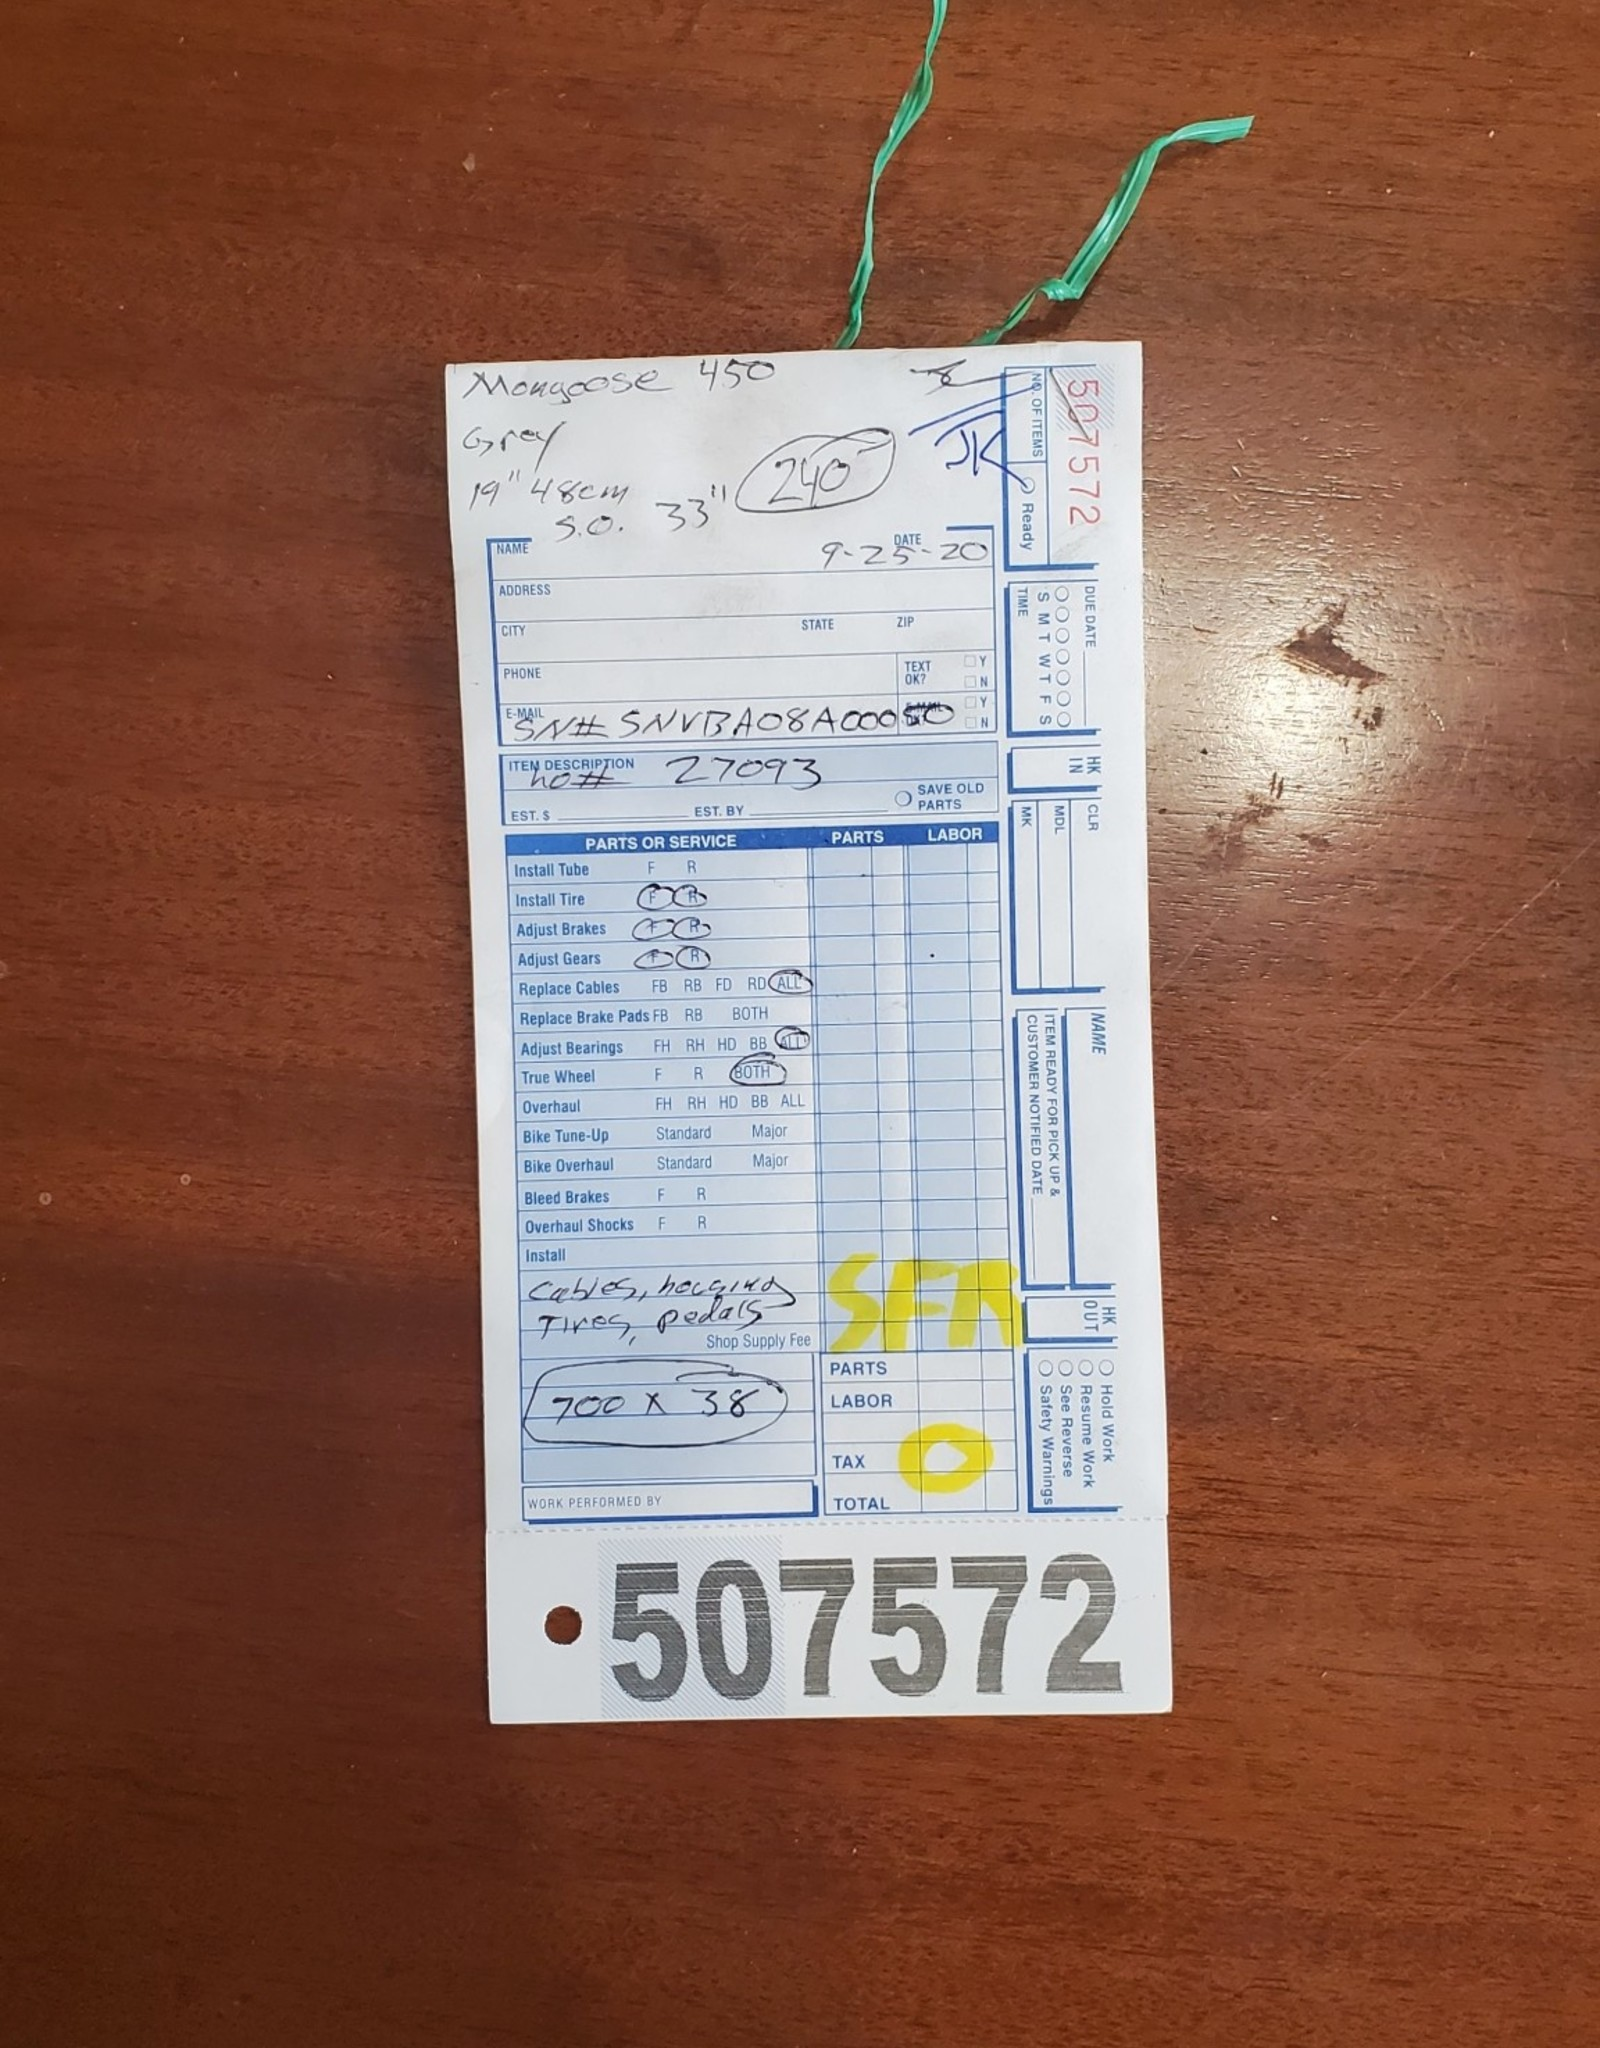 "19"" Mongoose 450 (0050 SFR)"